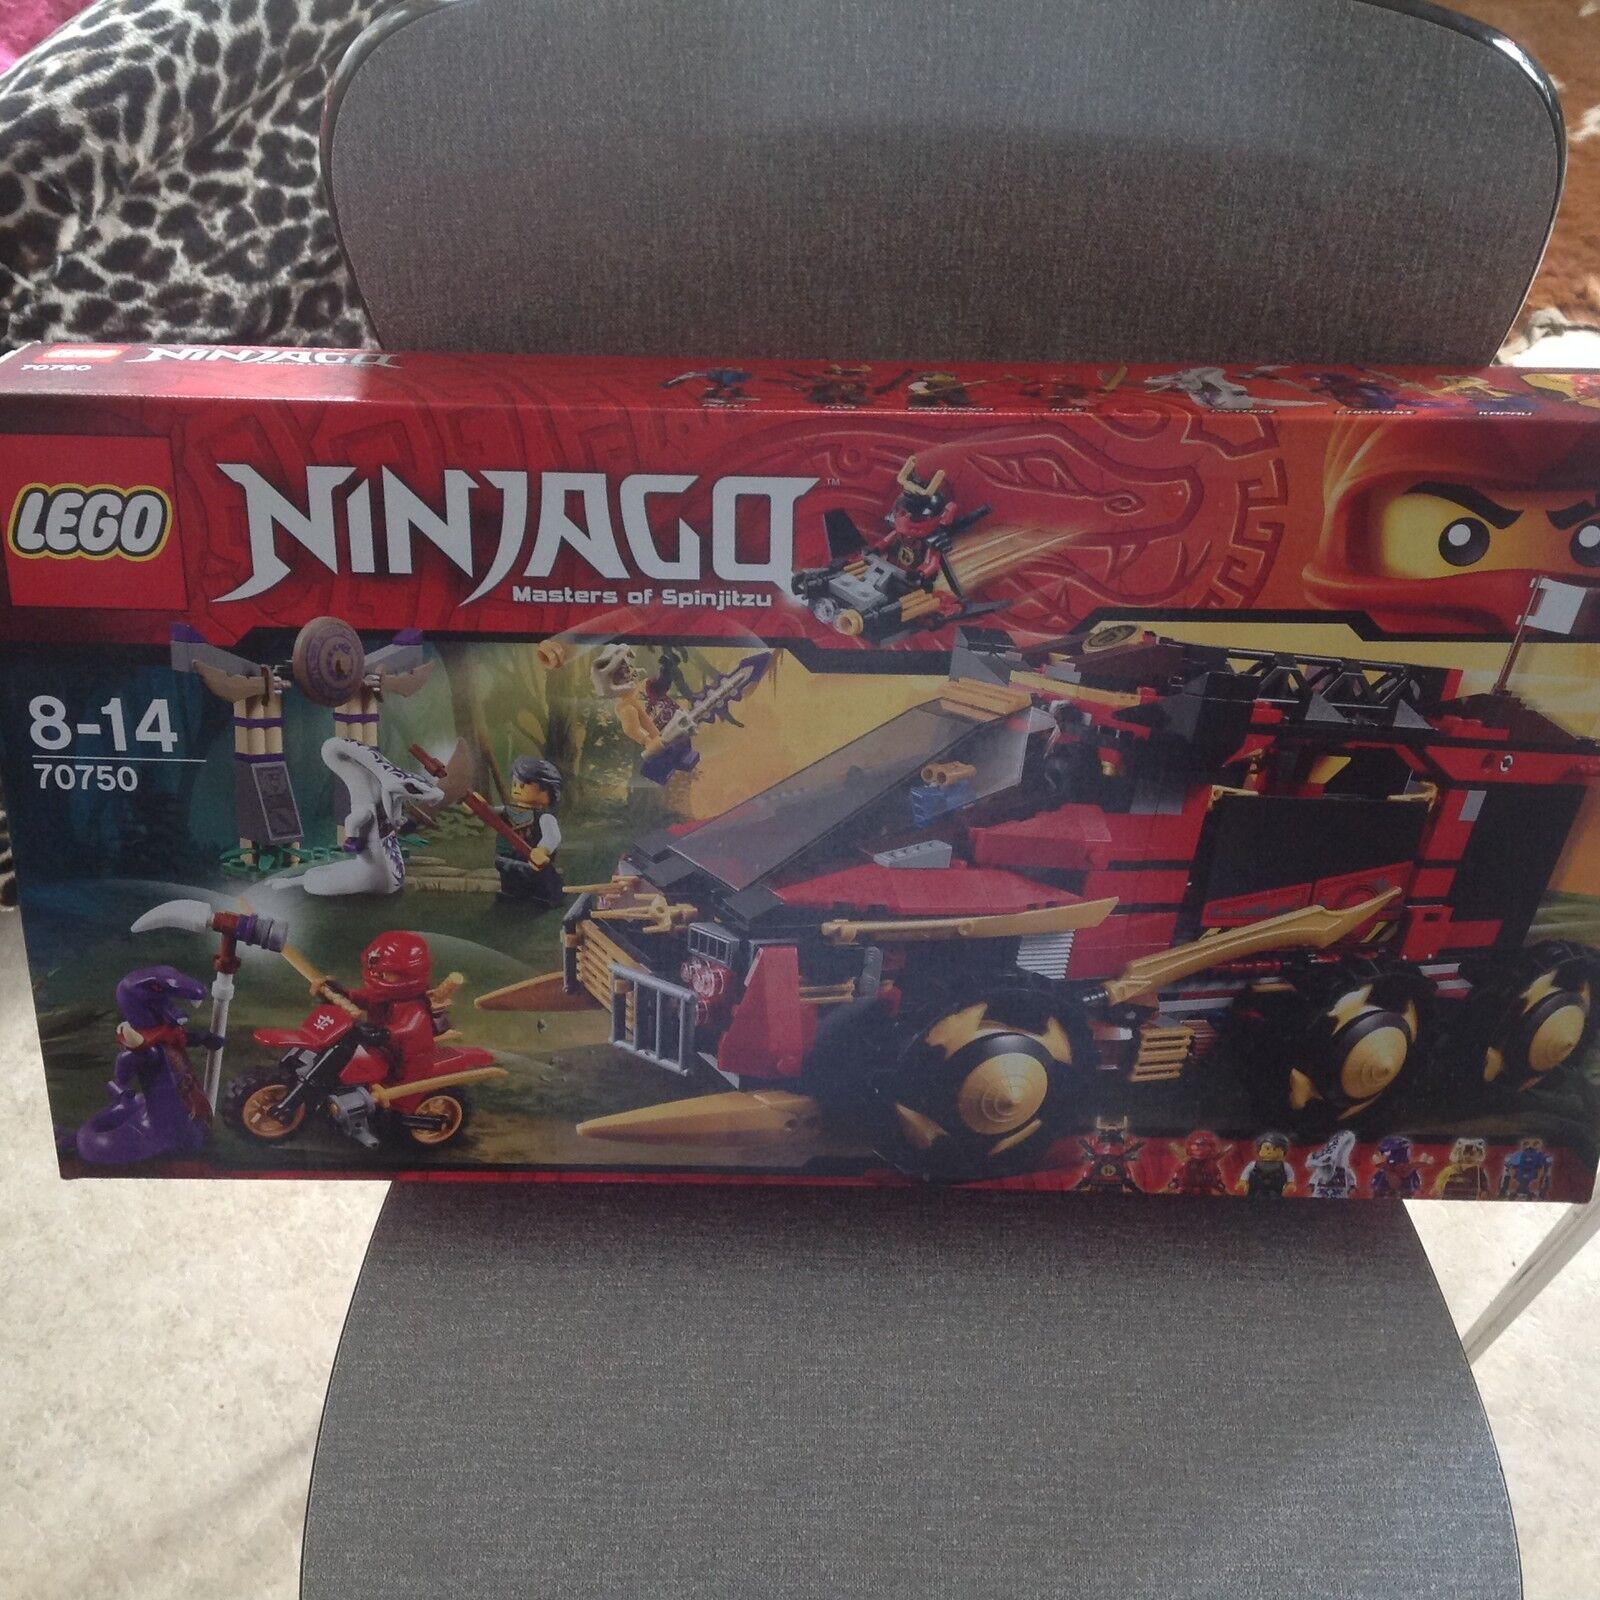 Lego 70750 Ninjago Masters of Spinjitzu